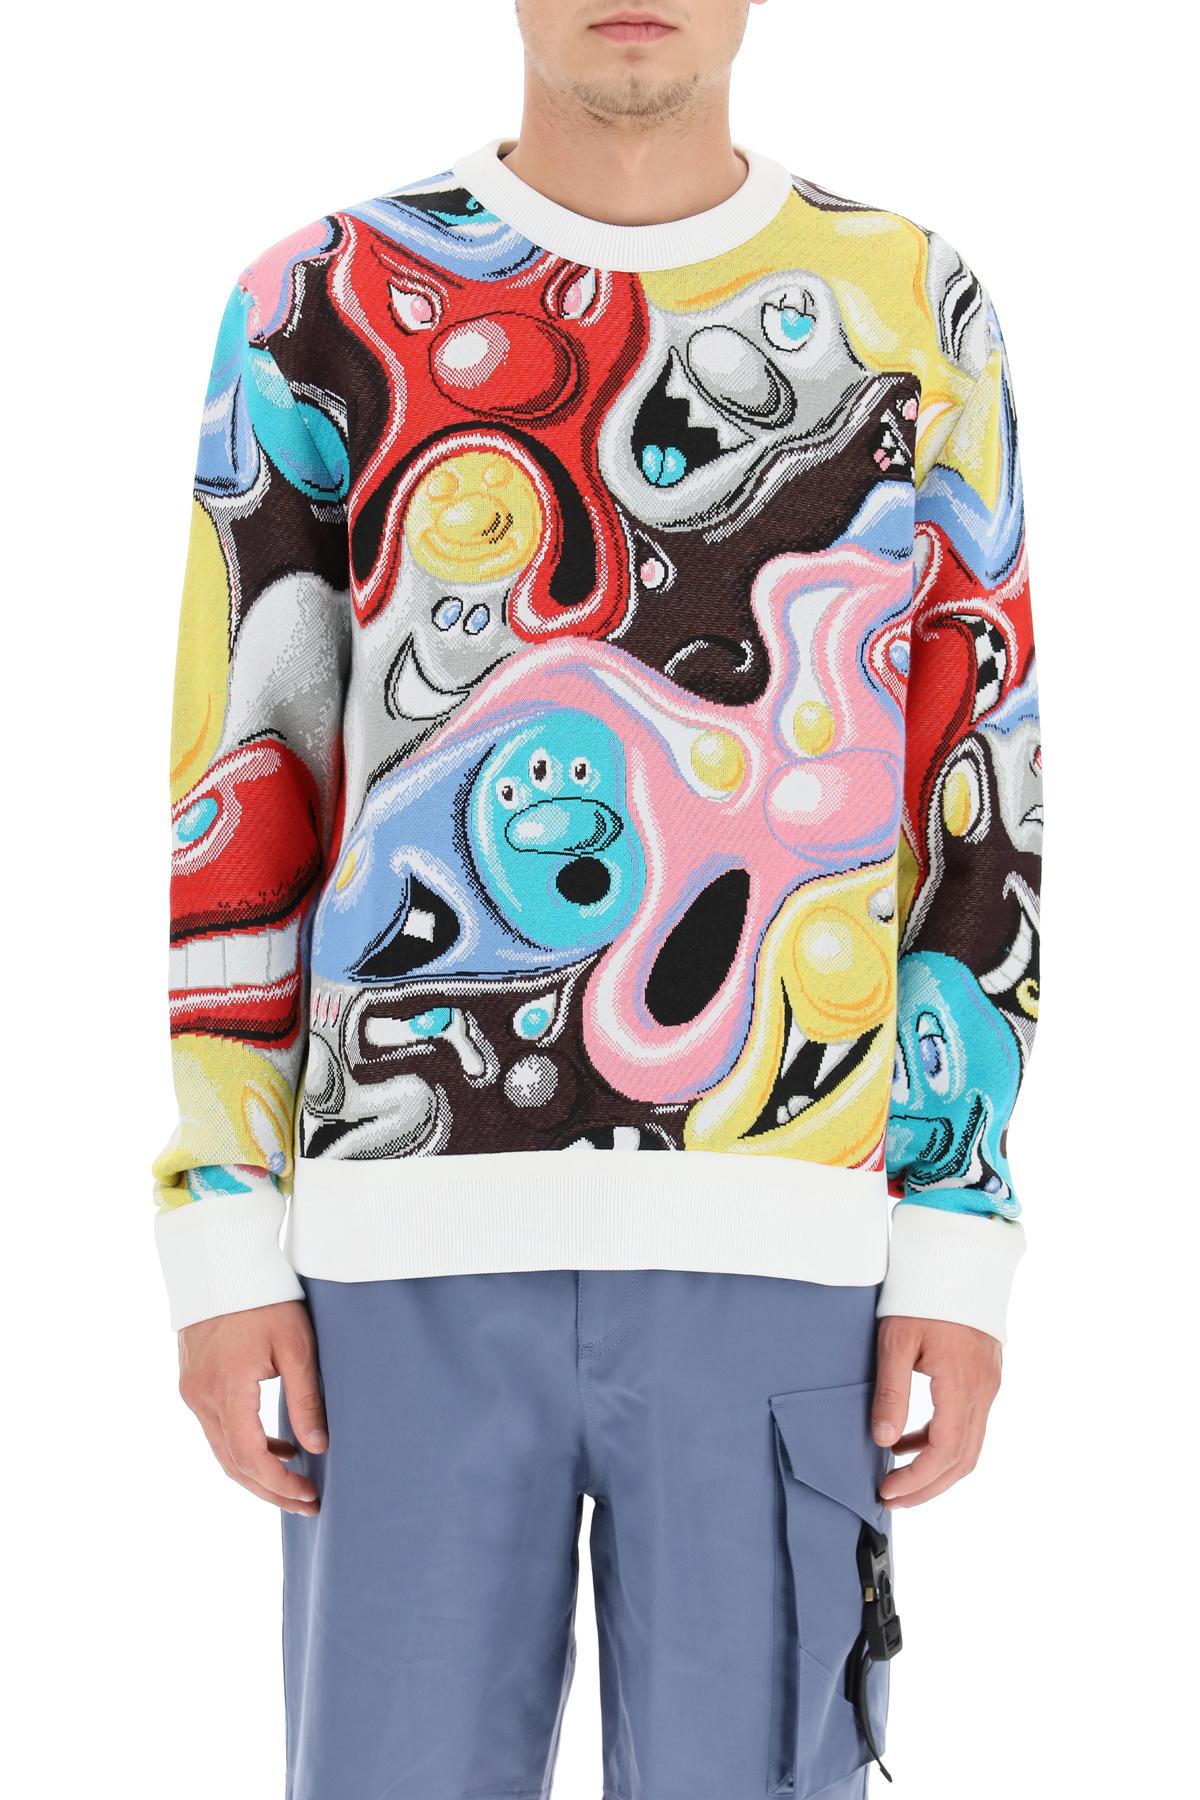 Dior maglione fantasia cartoon